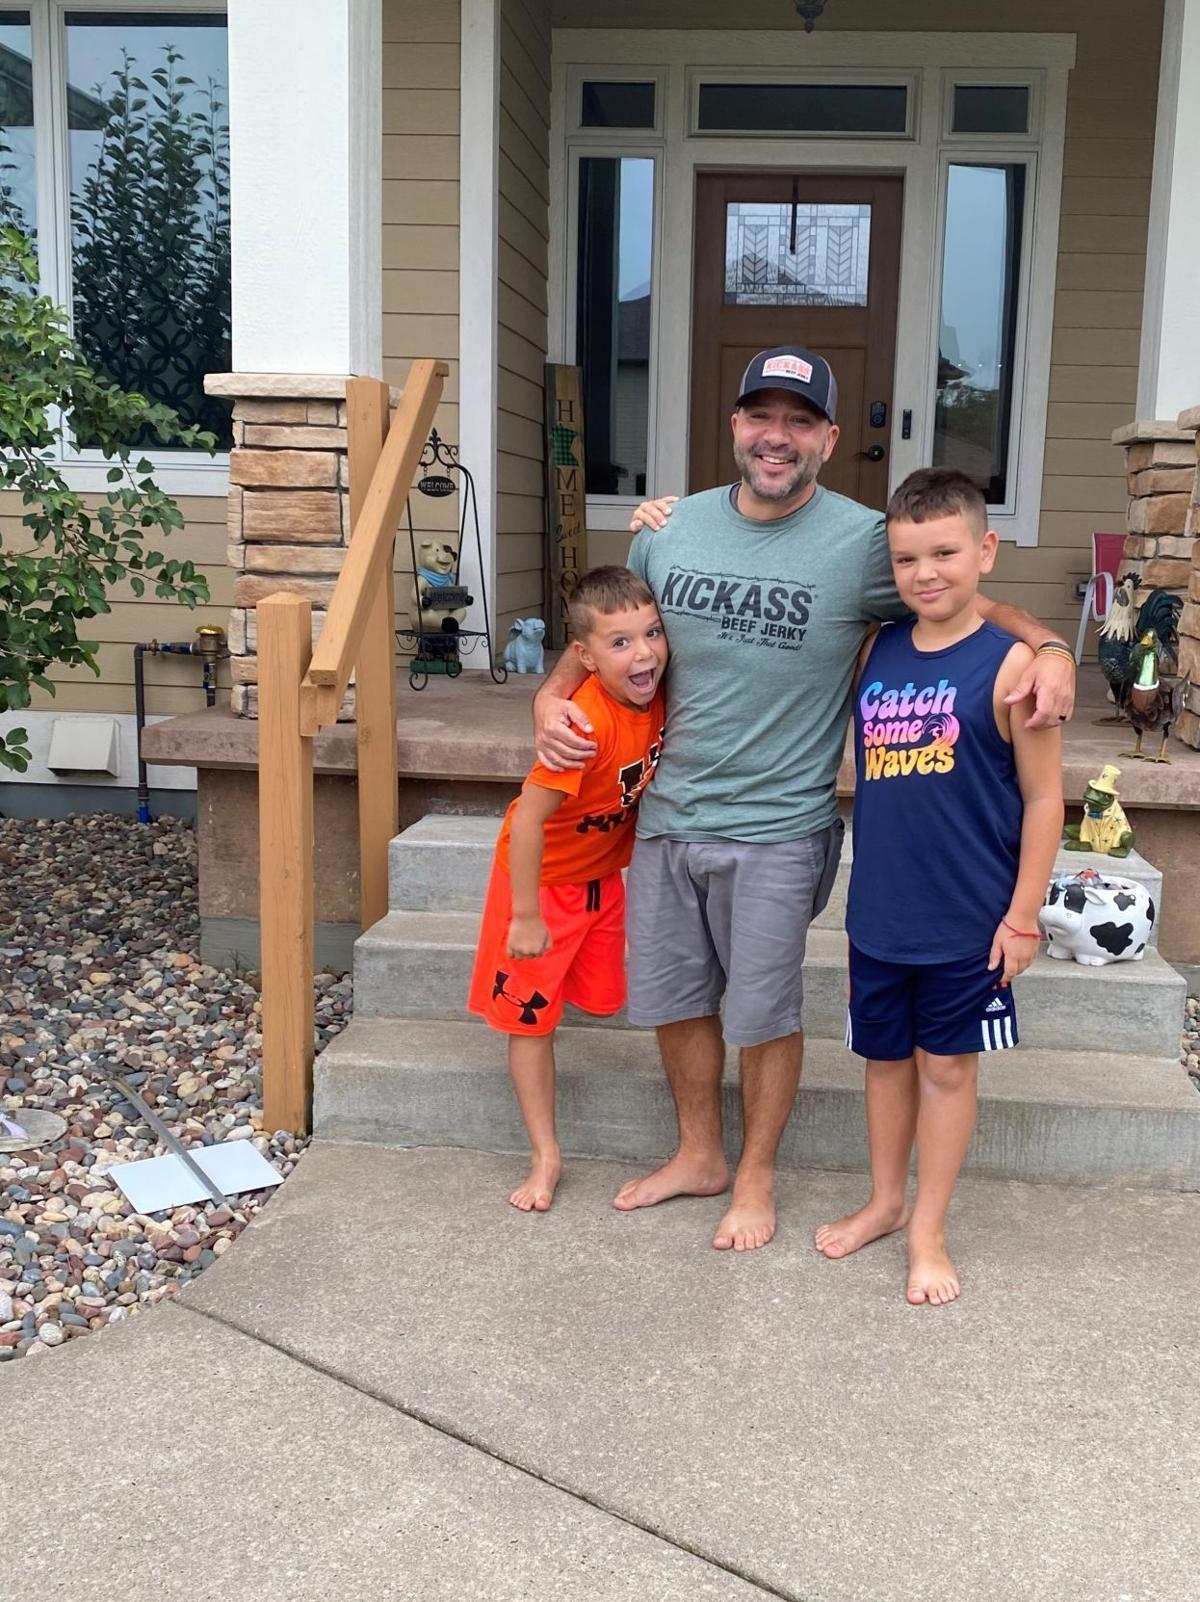 Jeremy Littel and children